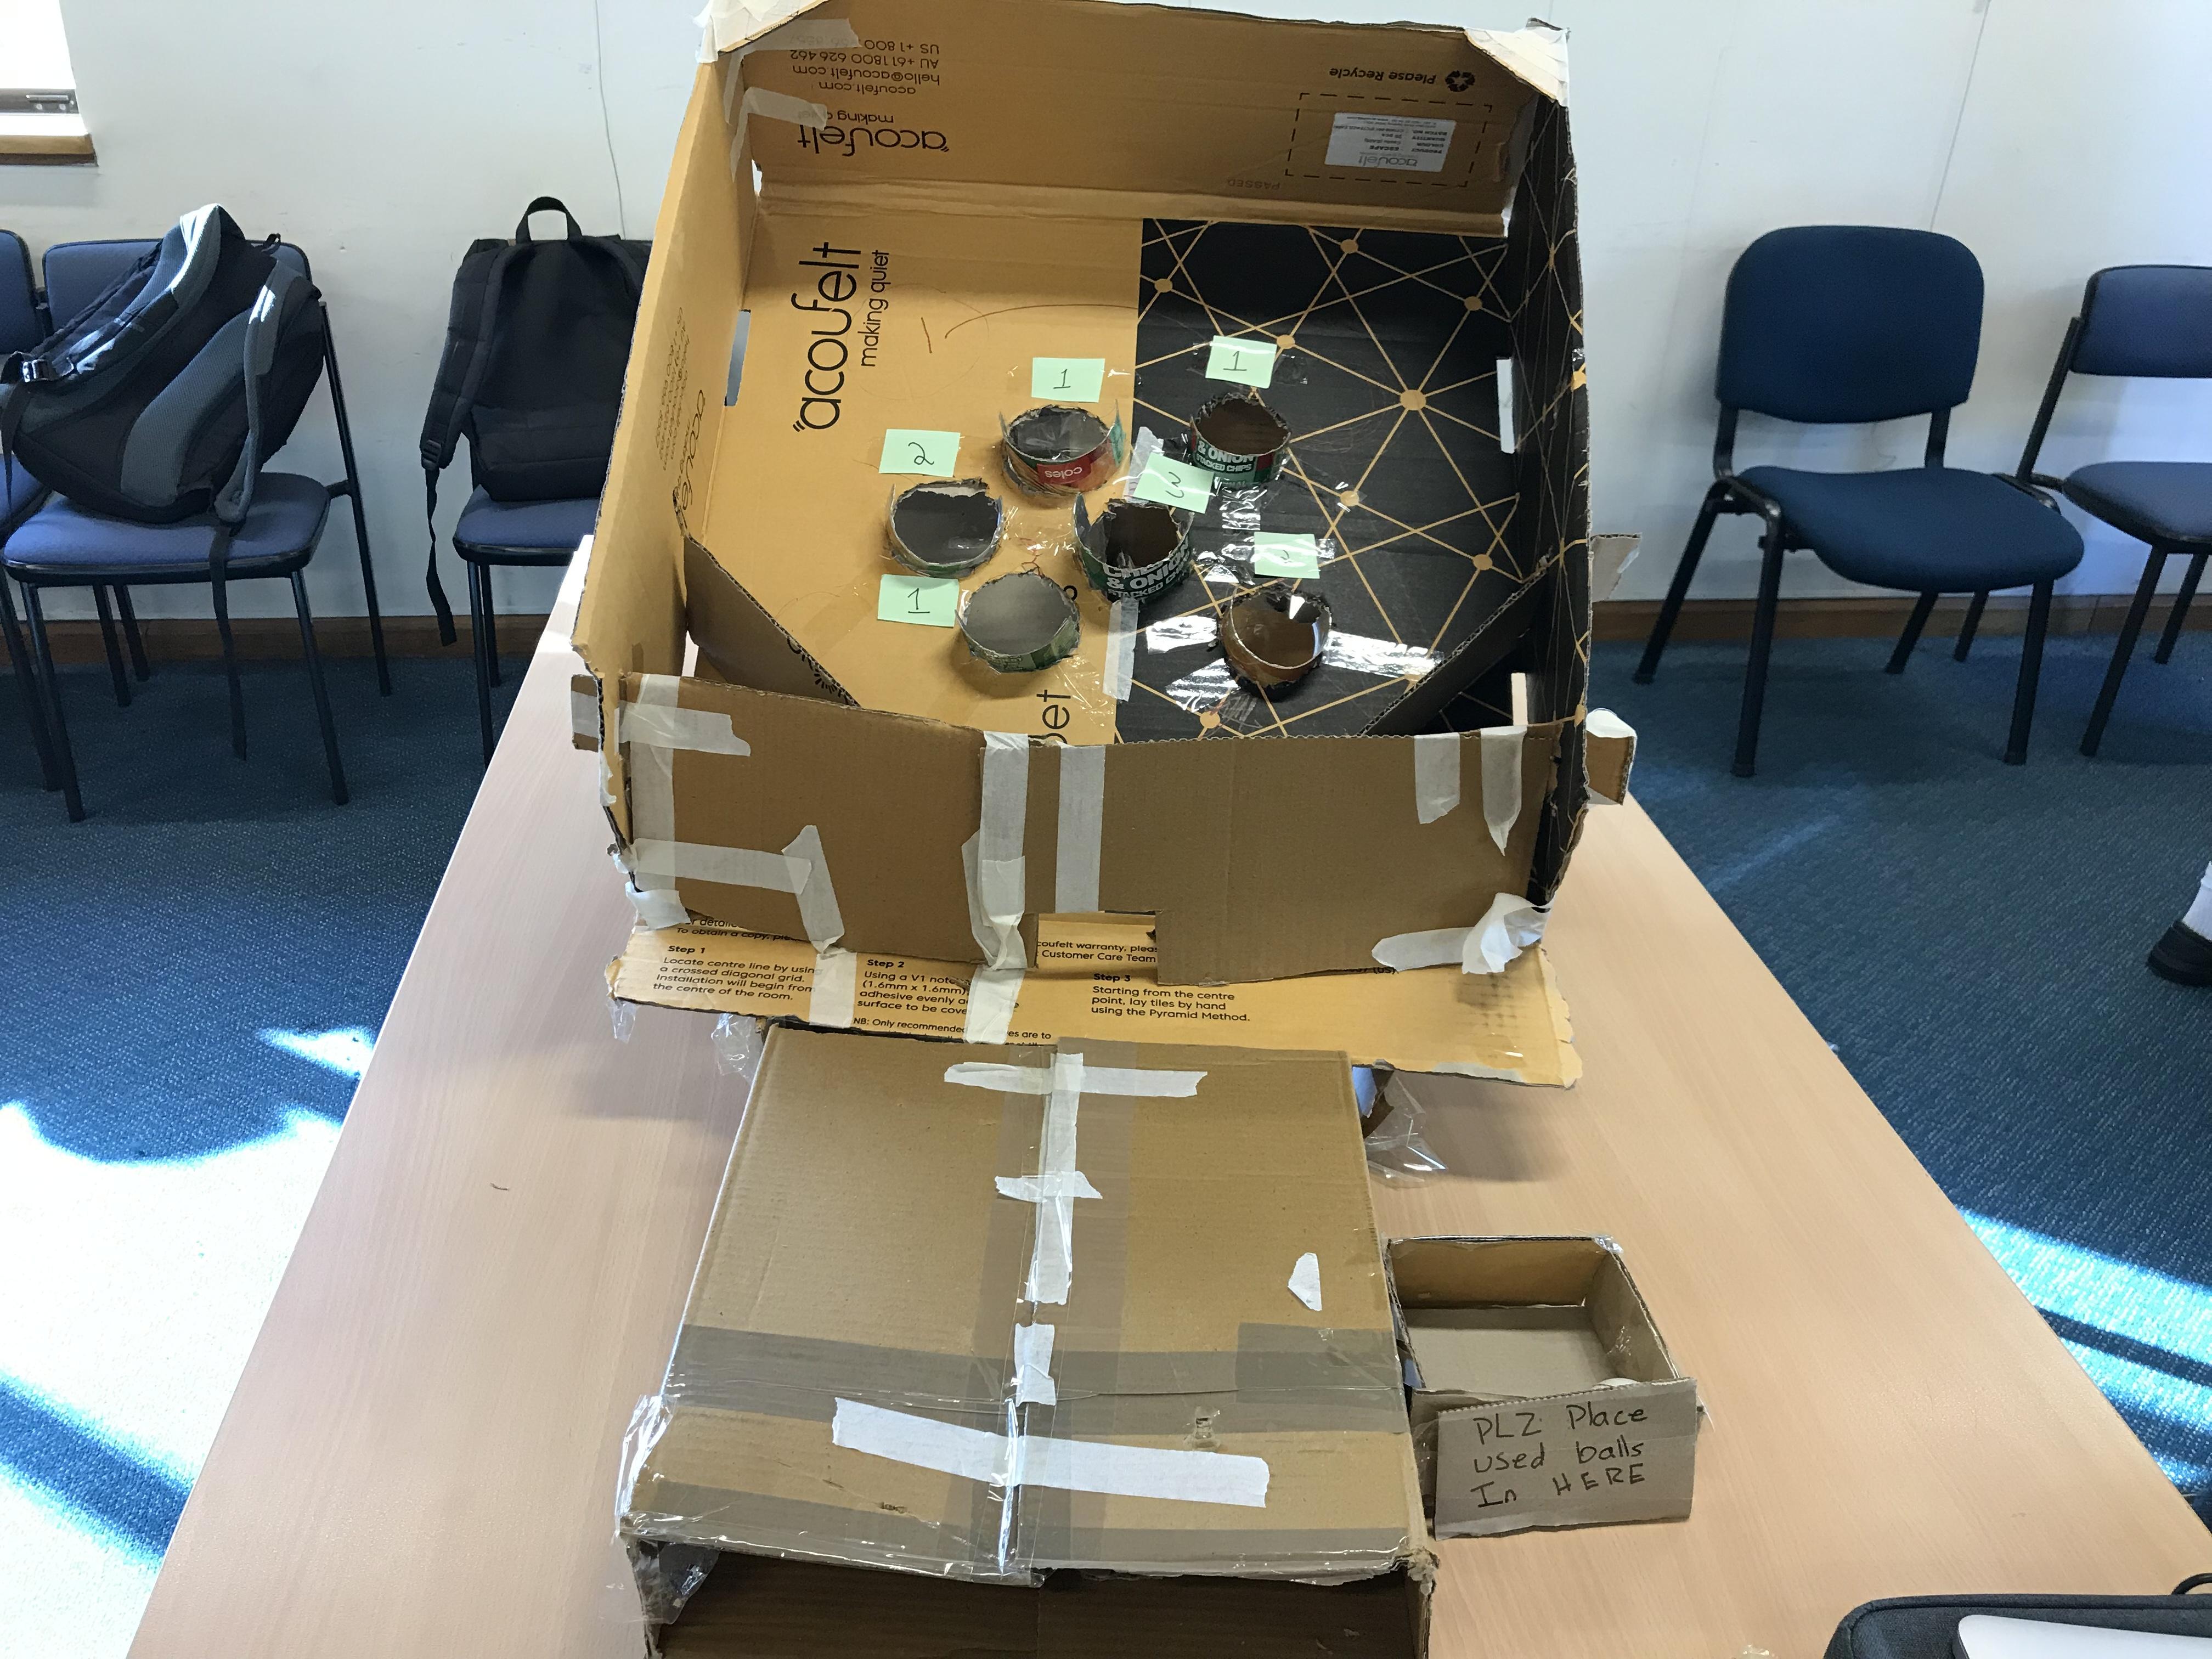 cardboard skeeball